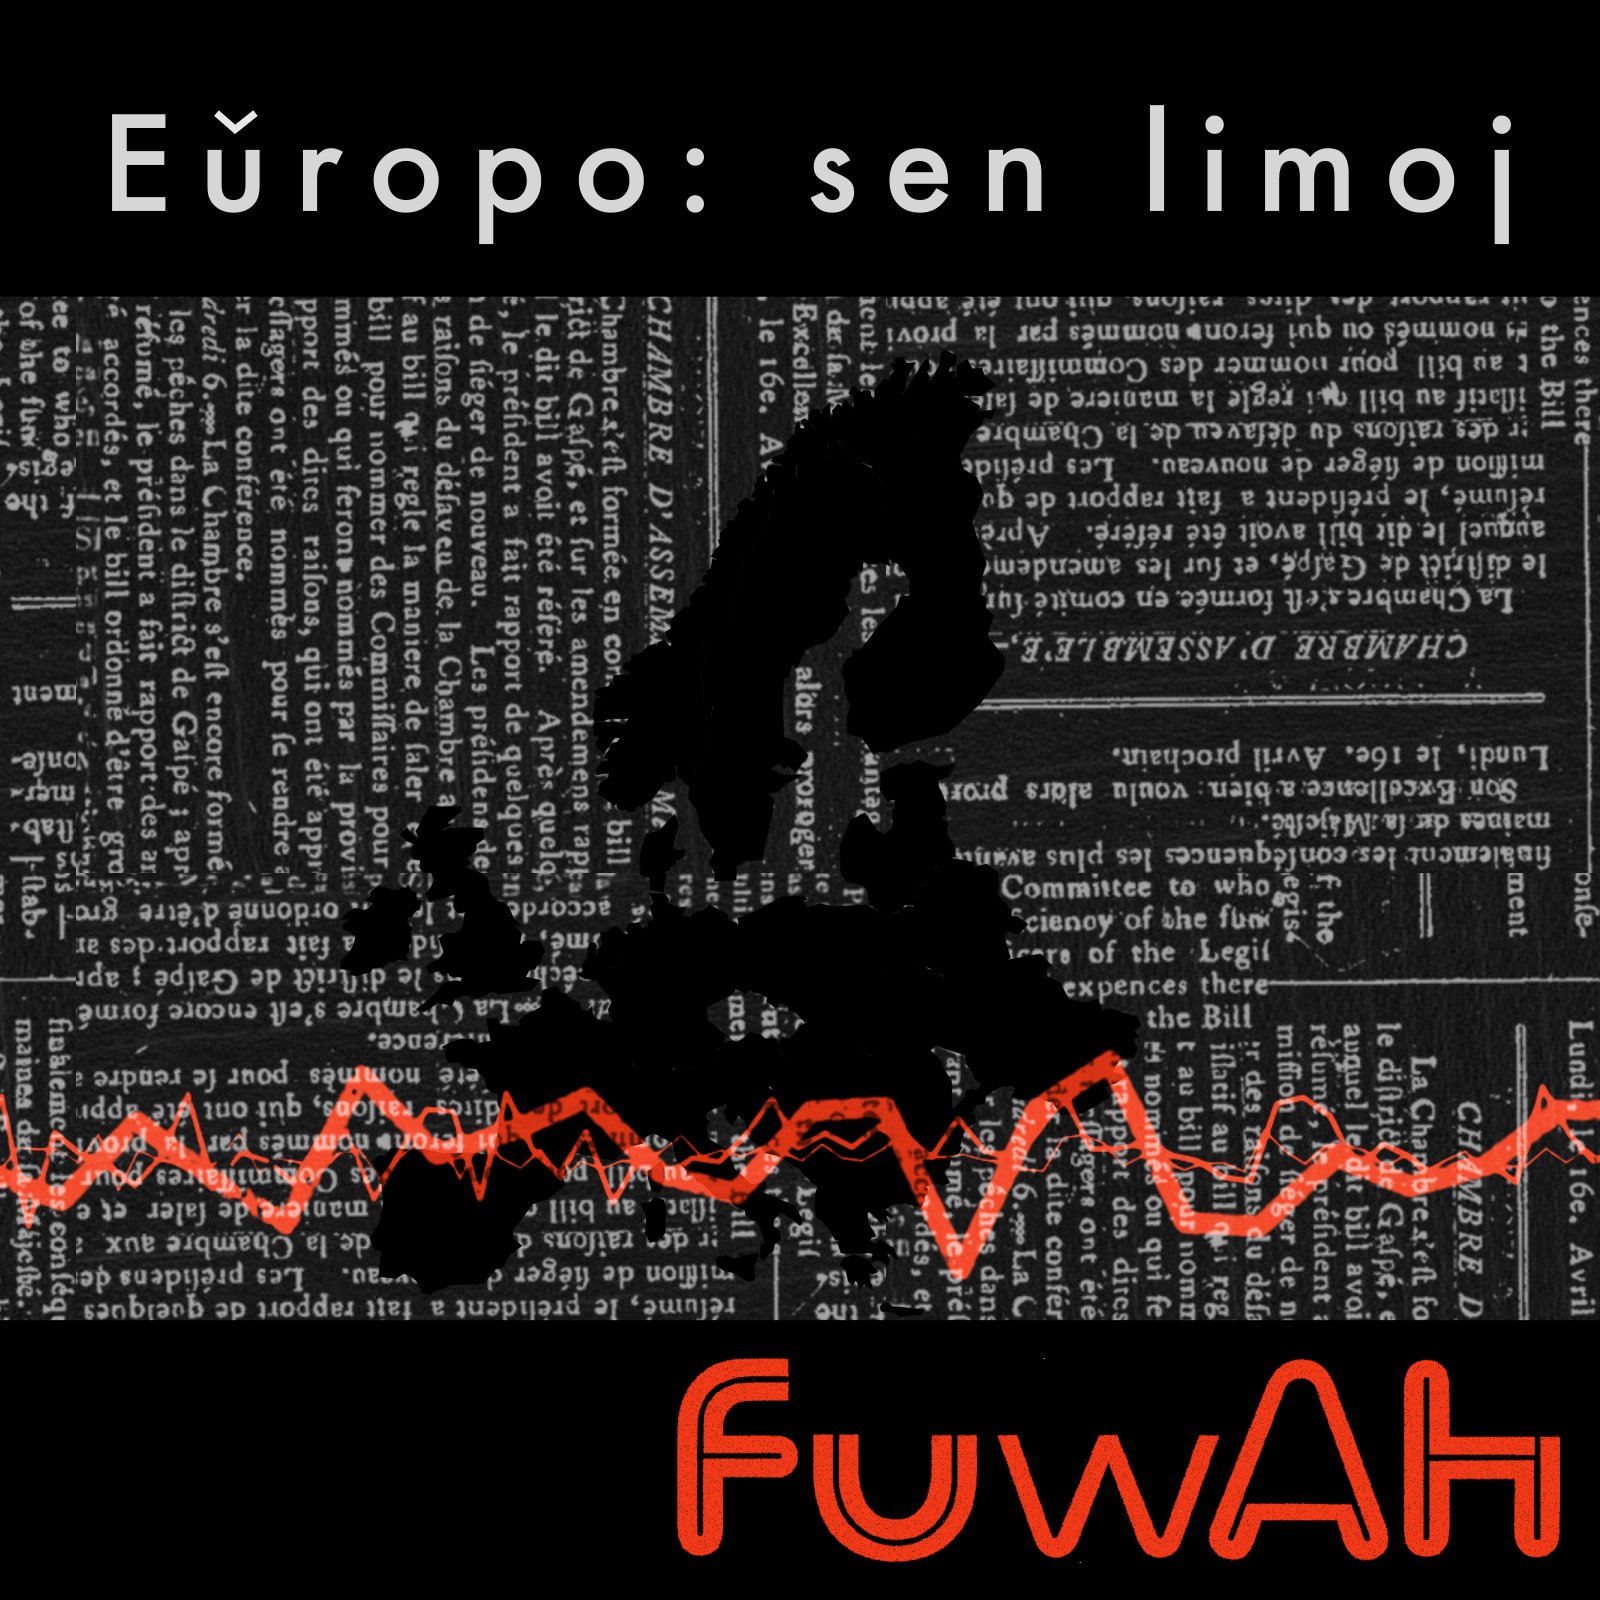 Eŭropo: sen limoj album launch and tour in April 2019, Artwork by  Izabela Barszcz , FUWAH name logo by Andrea Marconi.